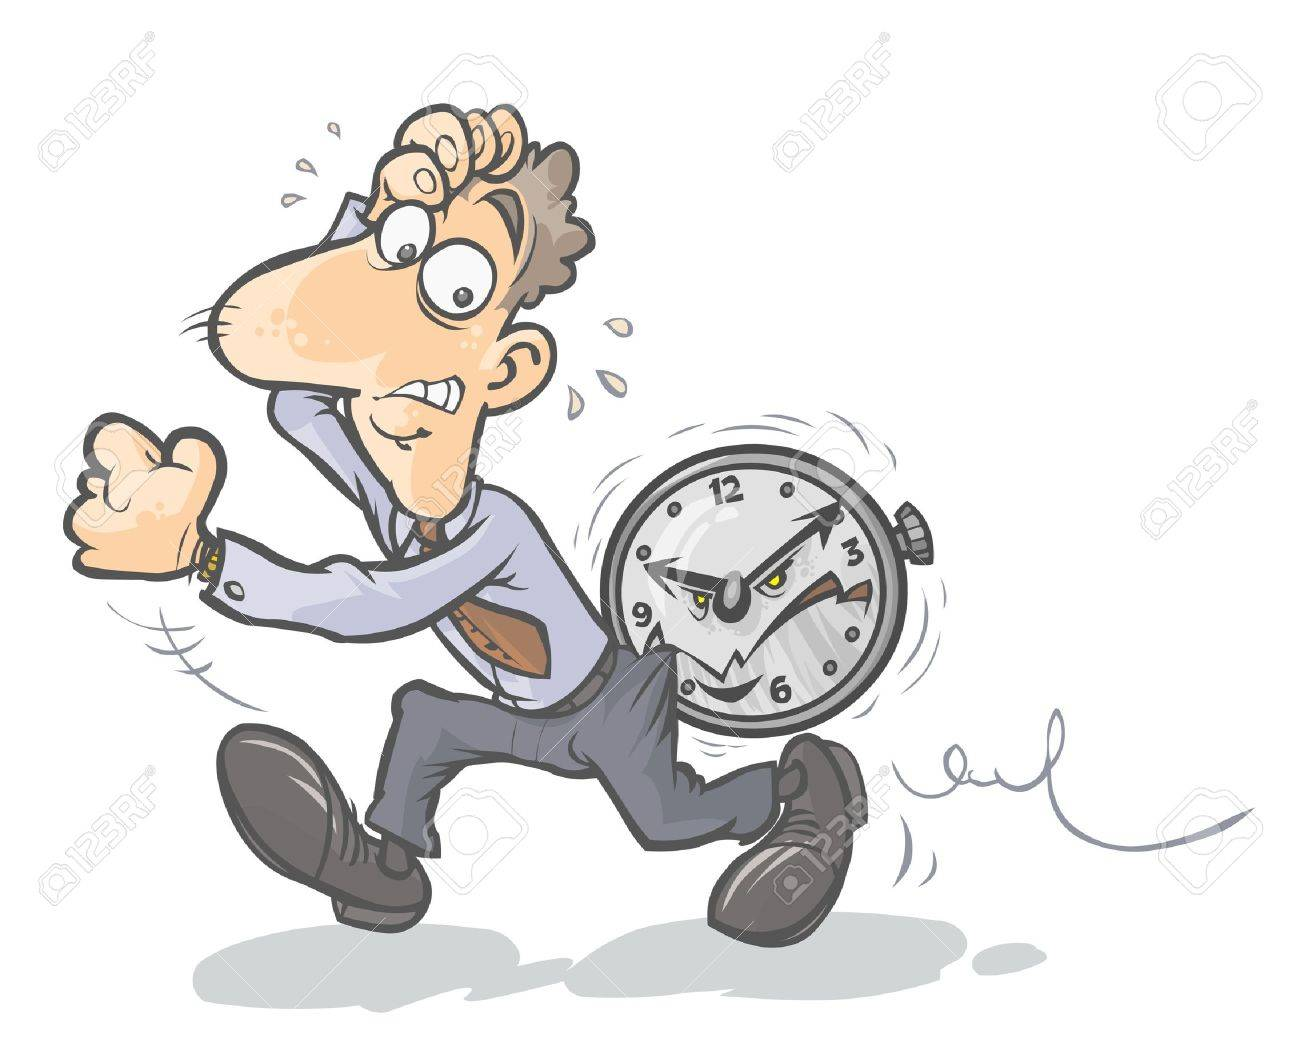 Hurried Businessman Stock Vector - 20685145